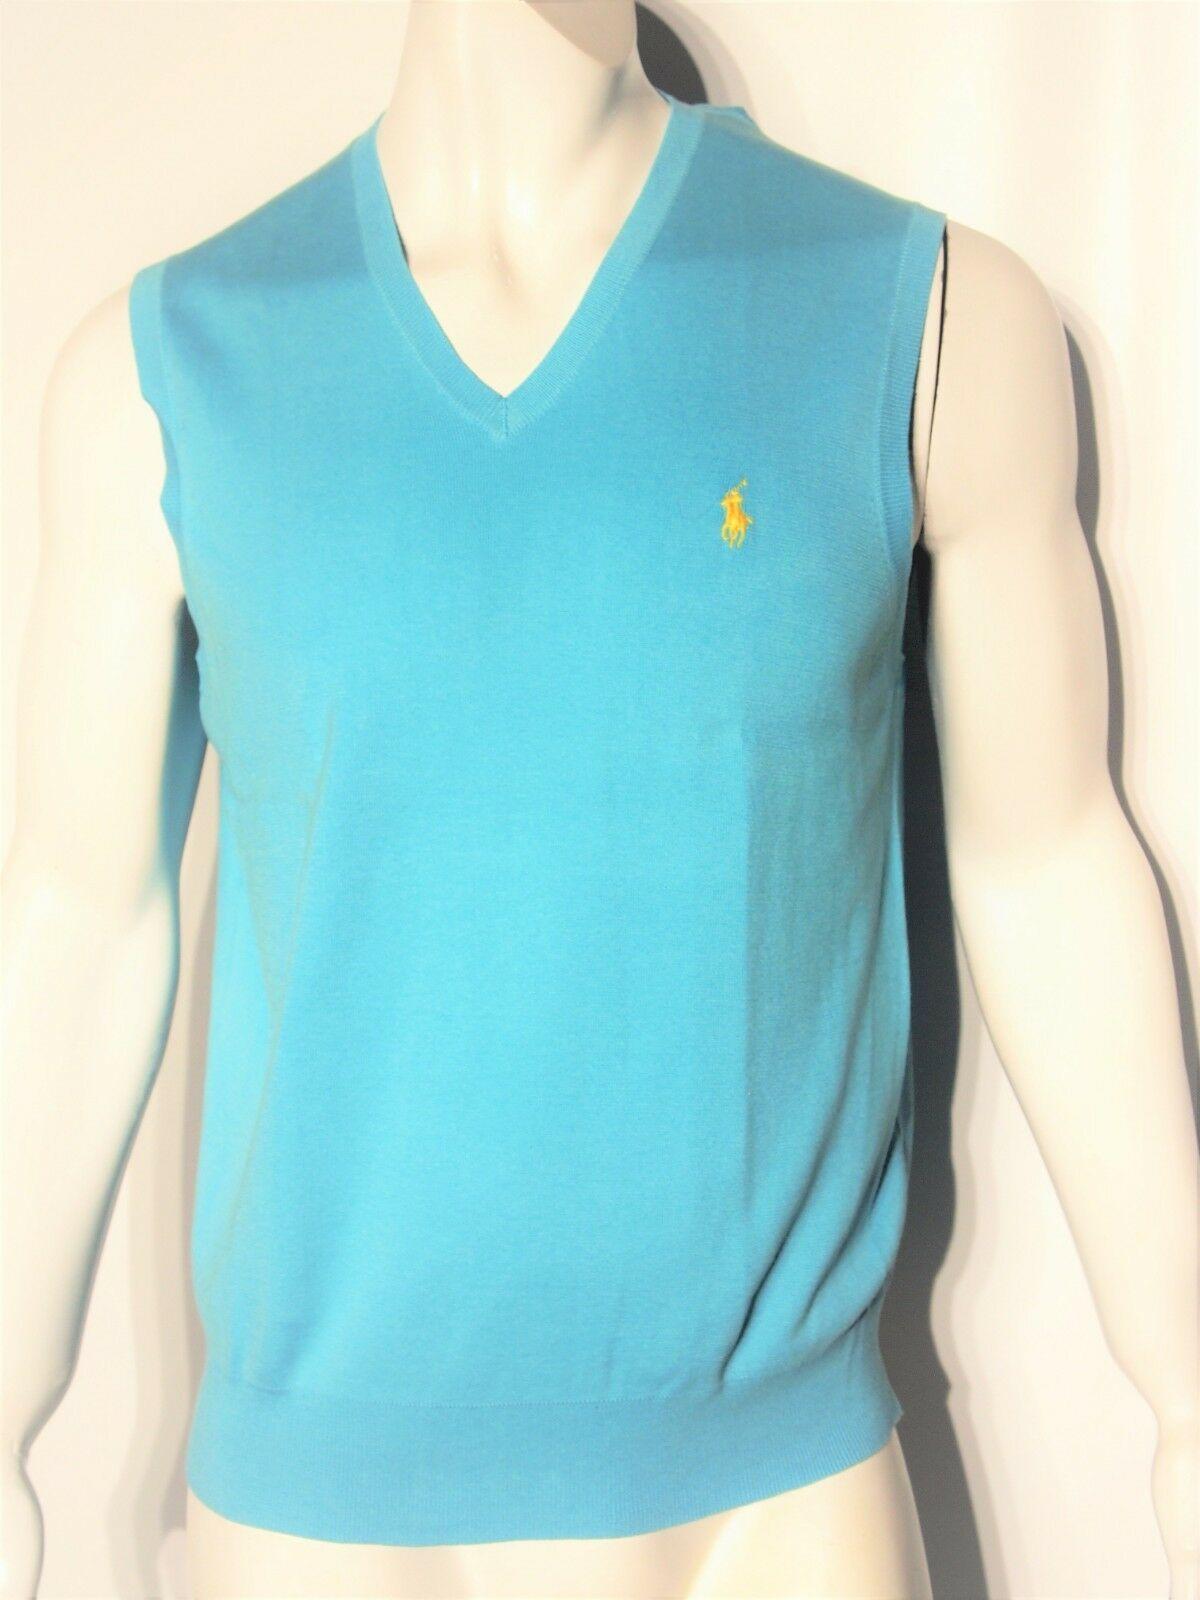 Polo Ralph Lauren mens pullover sweater vest size large